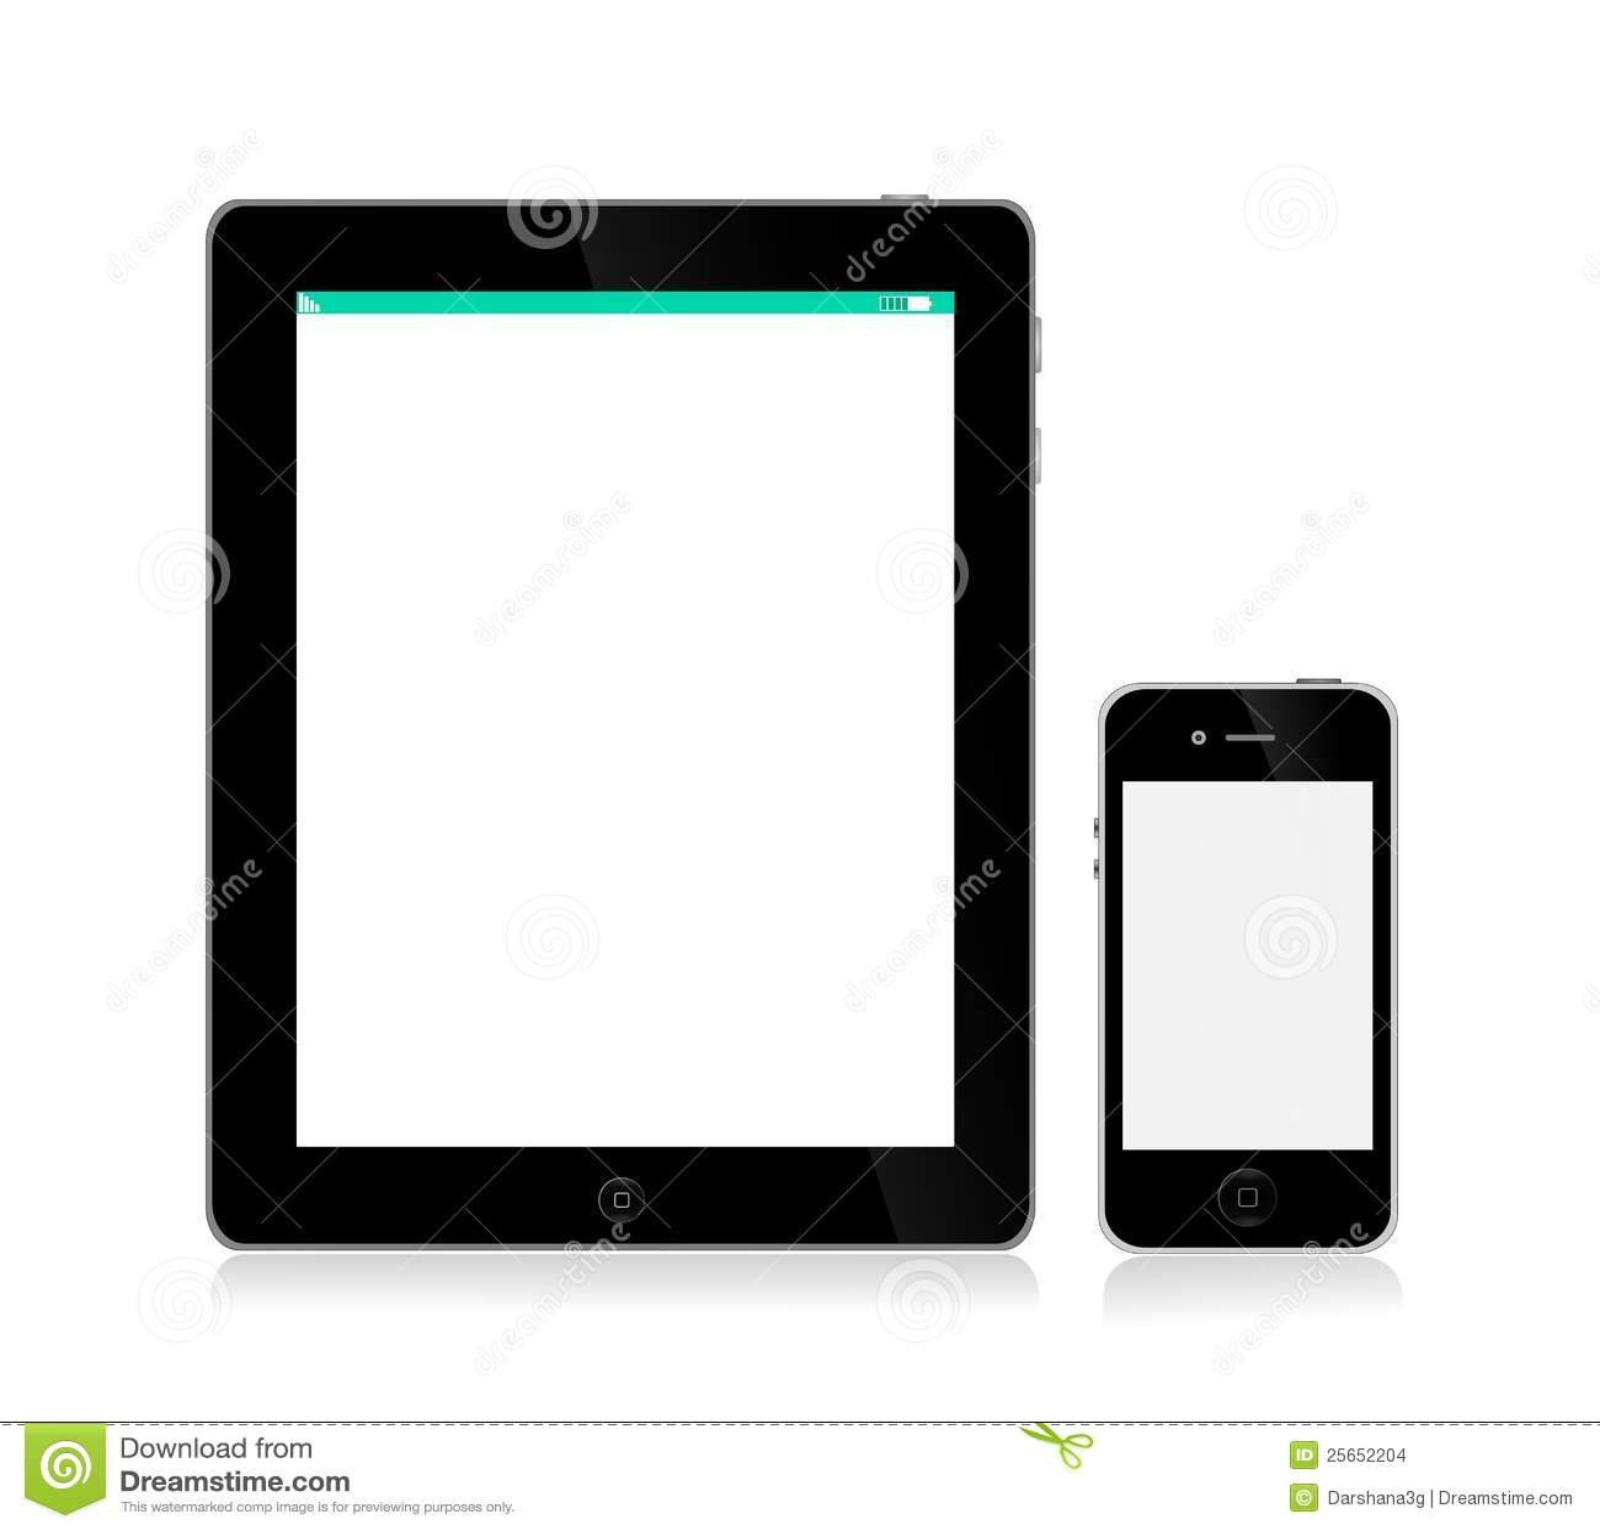 APPLE IPAD IPHONE Editorial Stock Image - Image: 25652204